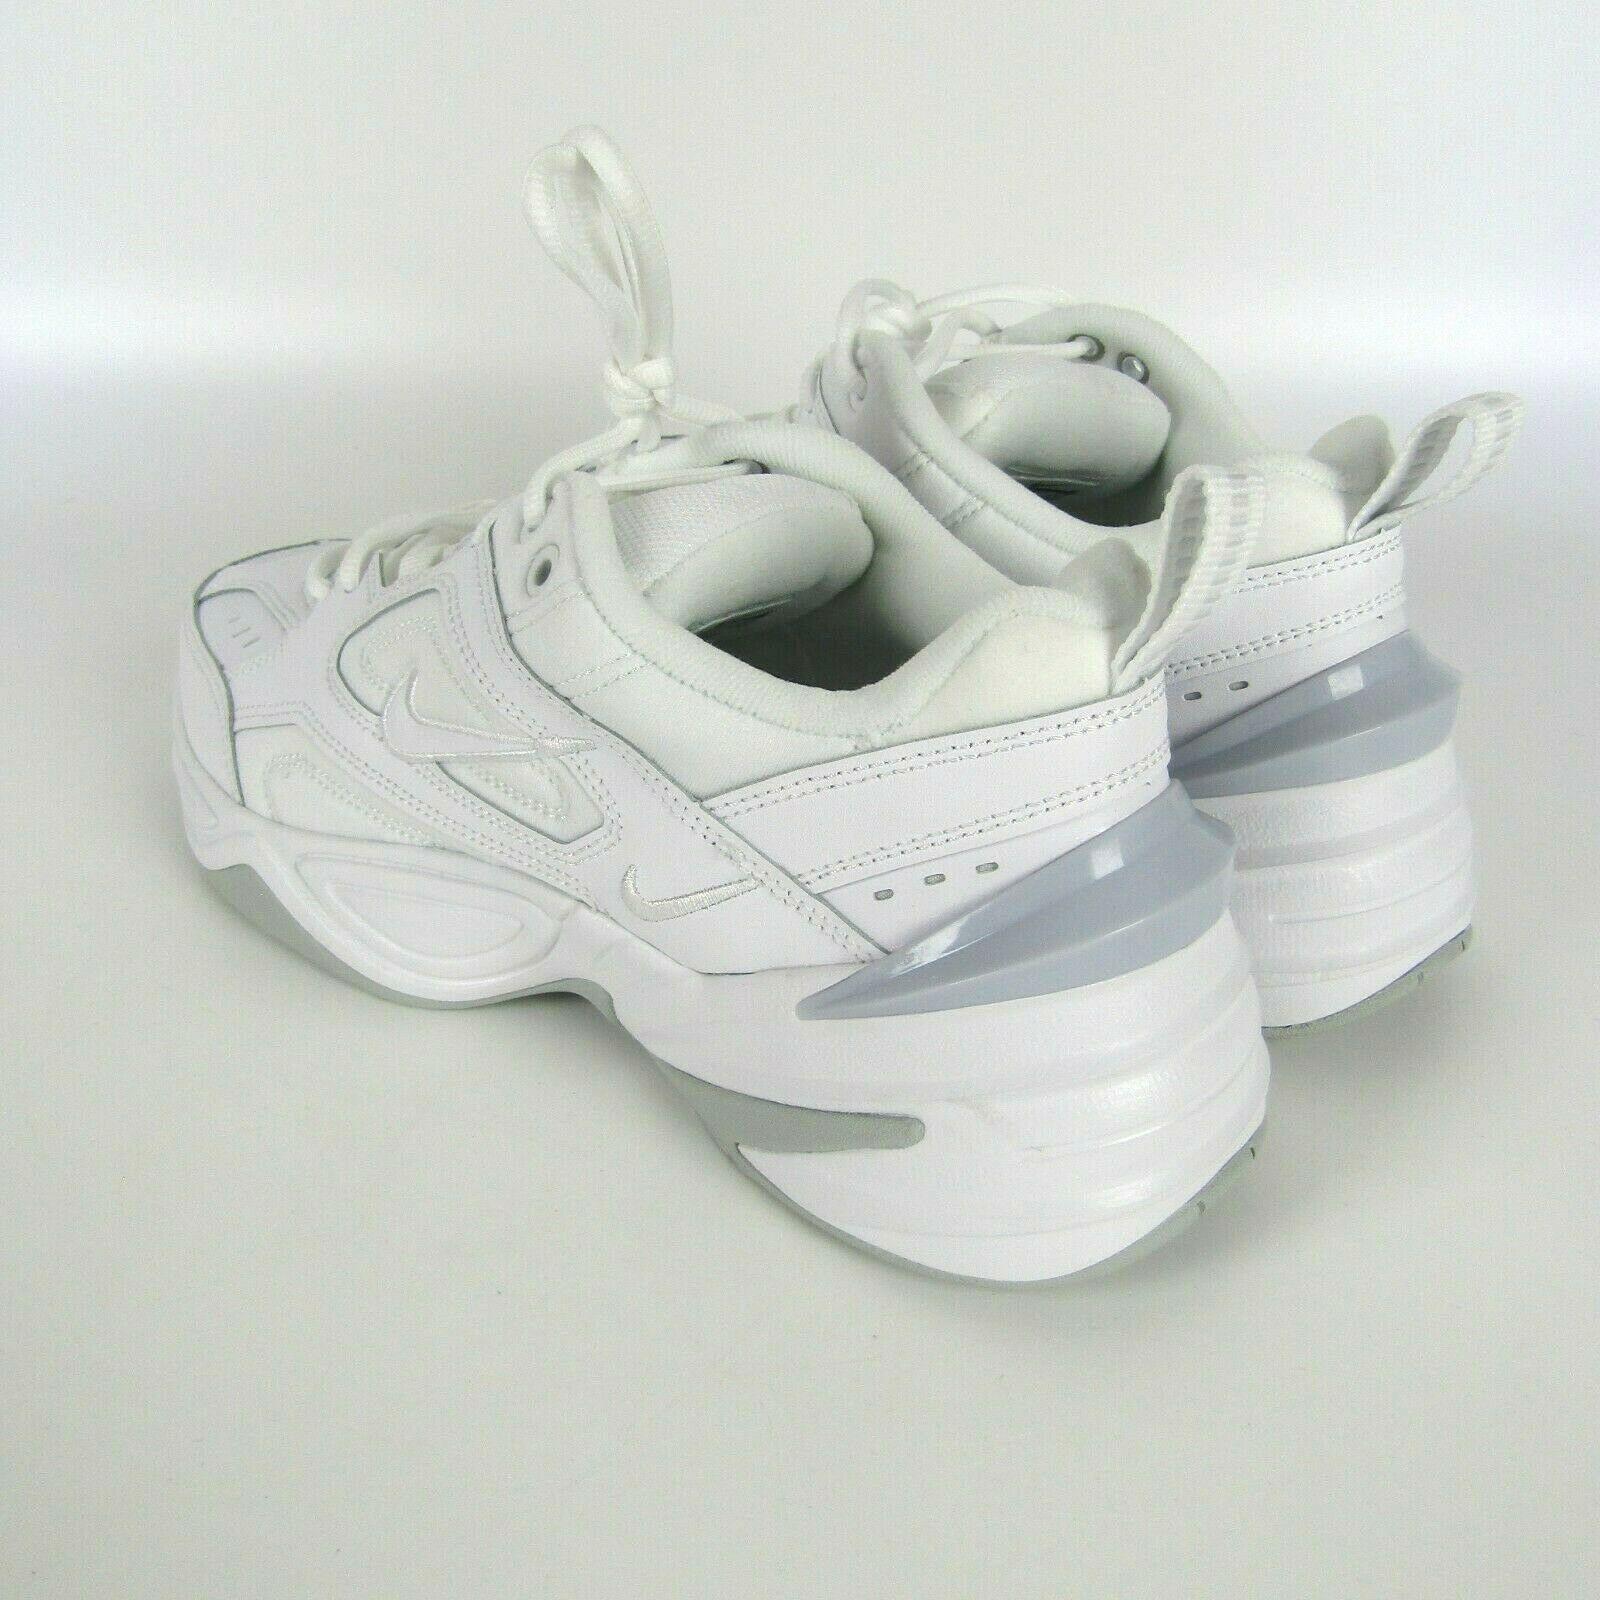 New NIKE M2K Tekno AV4789-101 White / Pure Platinum Mens Shoes Sneakers size 9.5